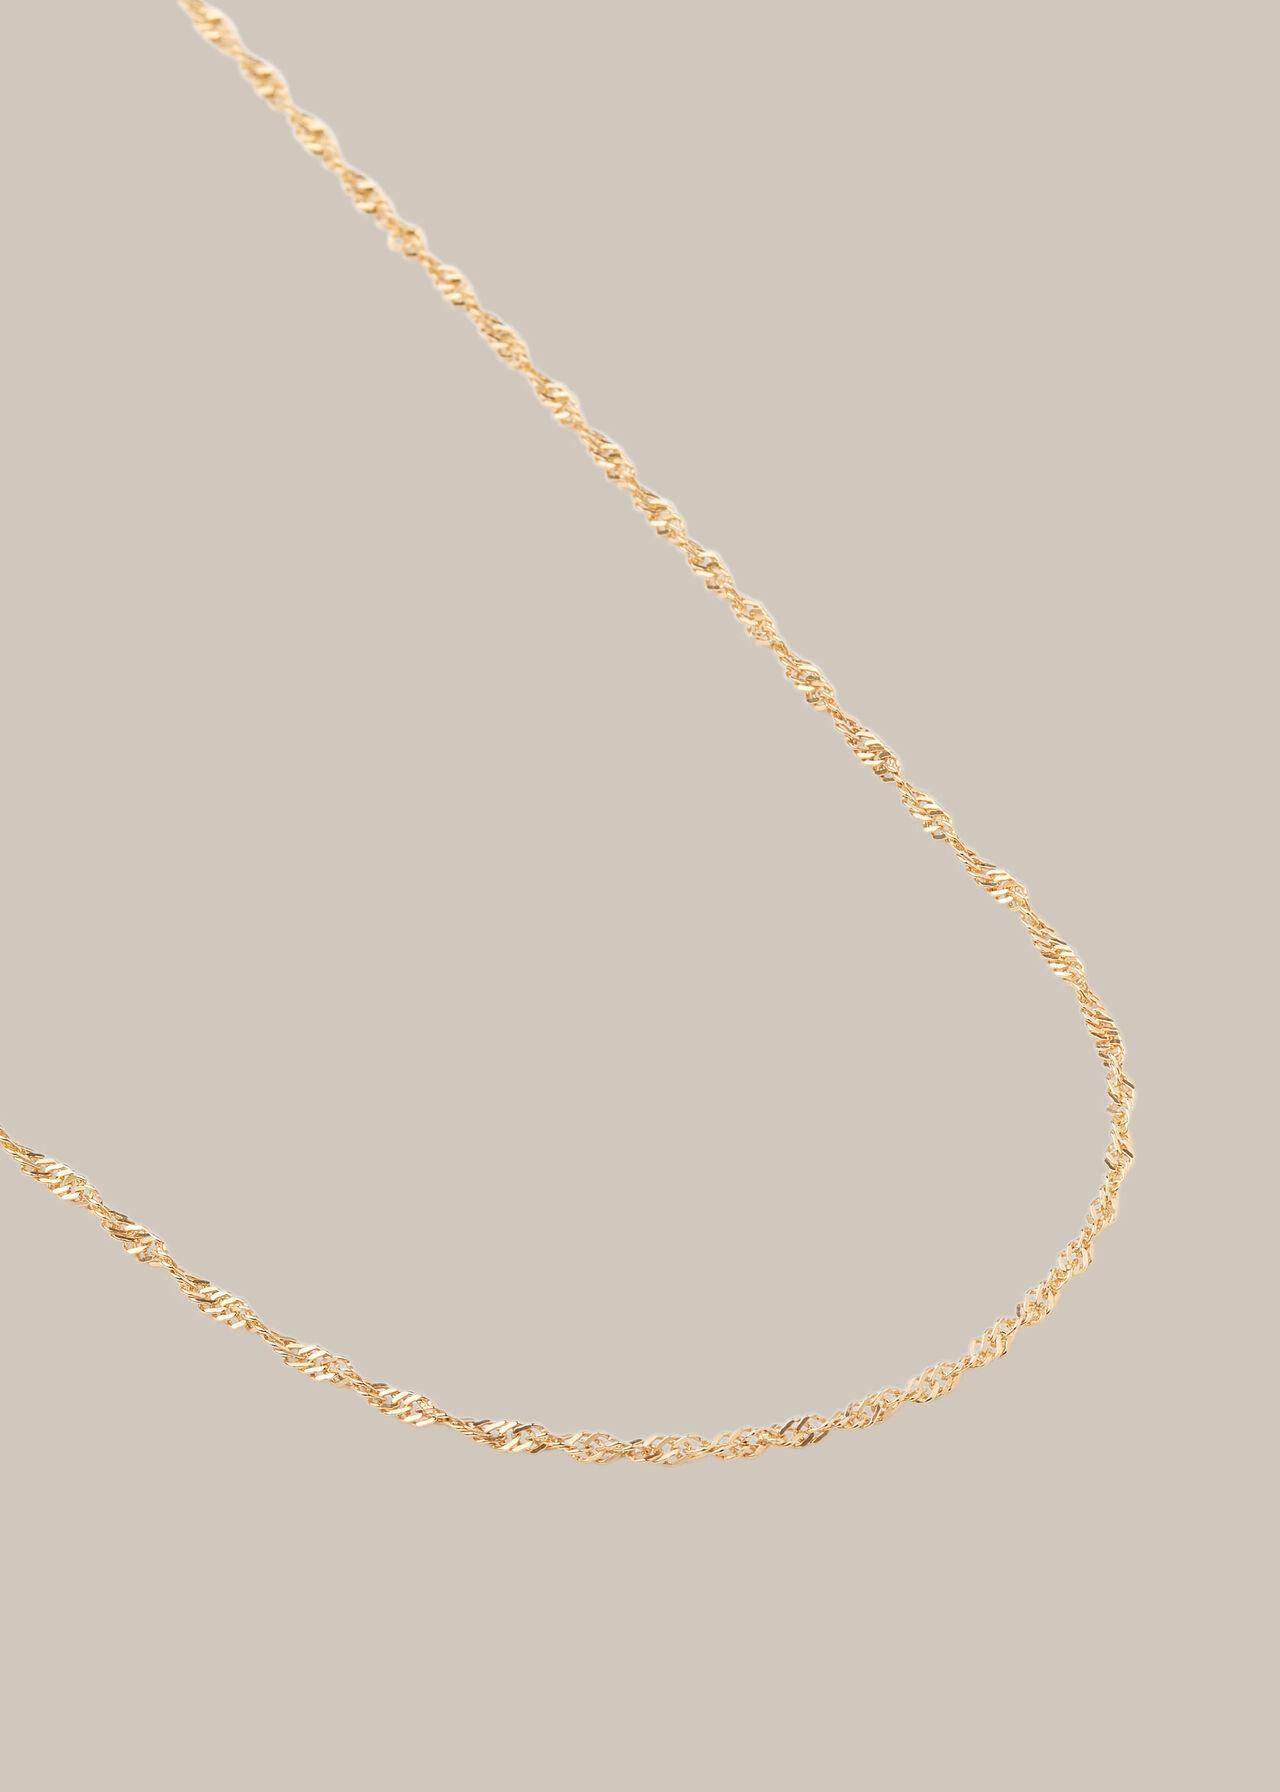 Rachel Jackson Twisted Chain